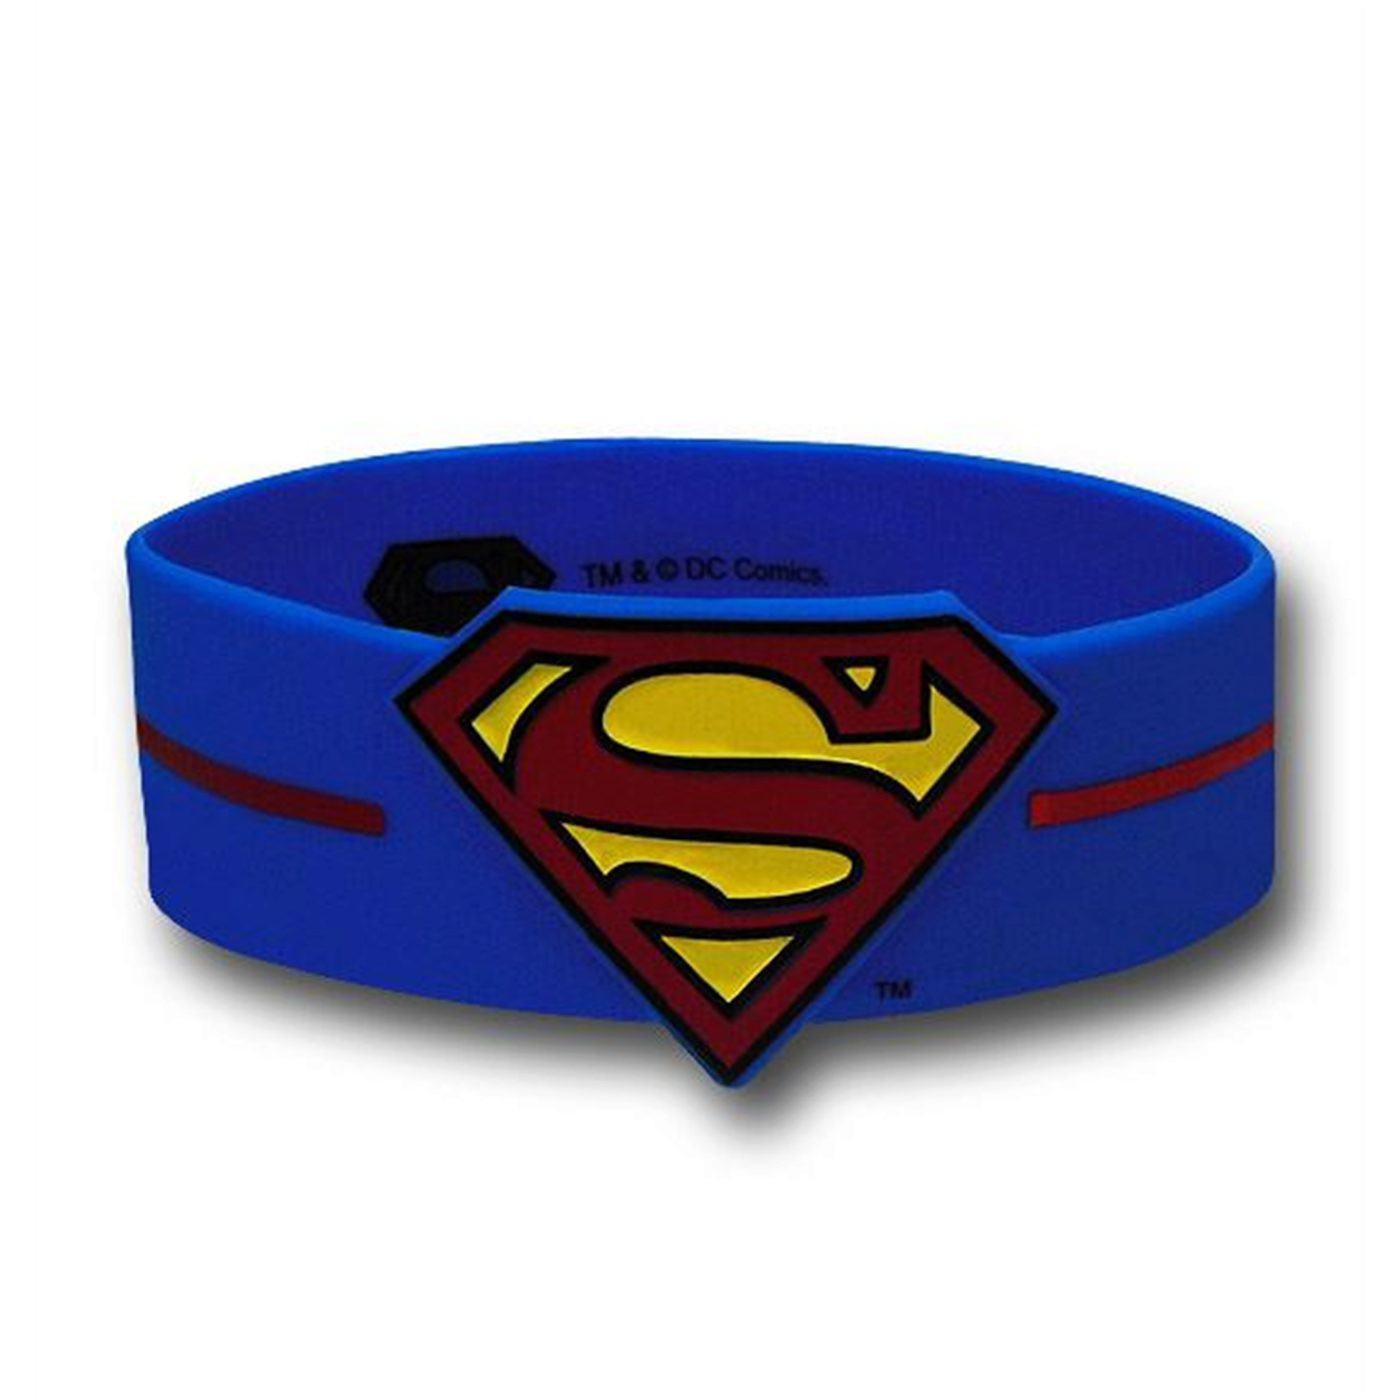 Superman Symbol and Logo Striped Rubber Wristband